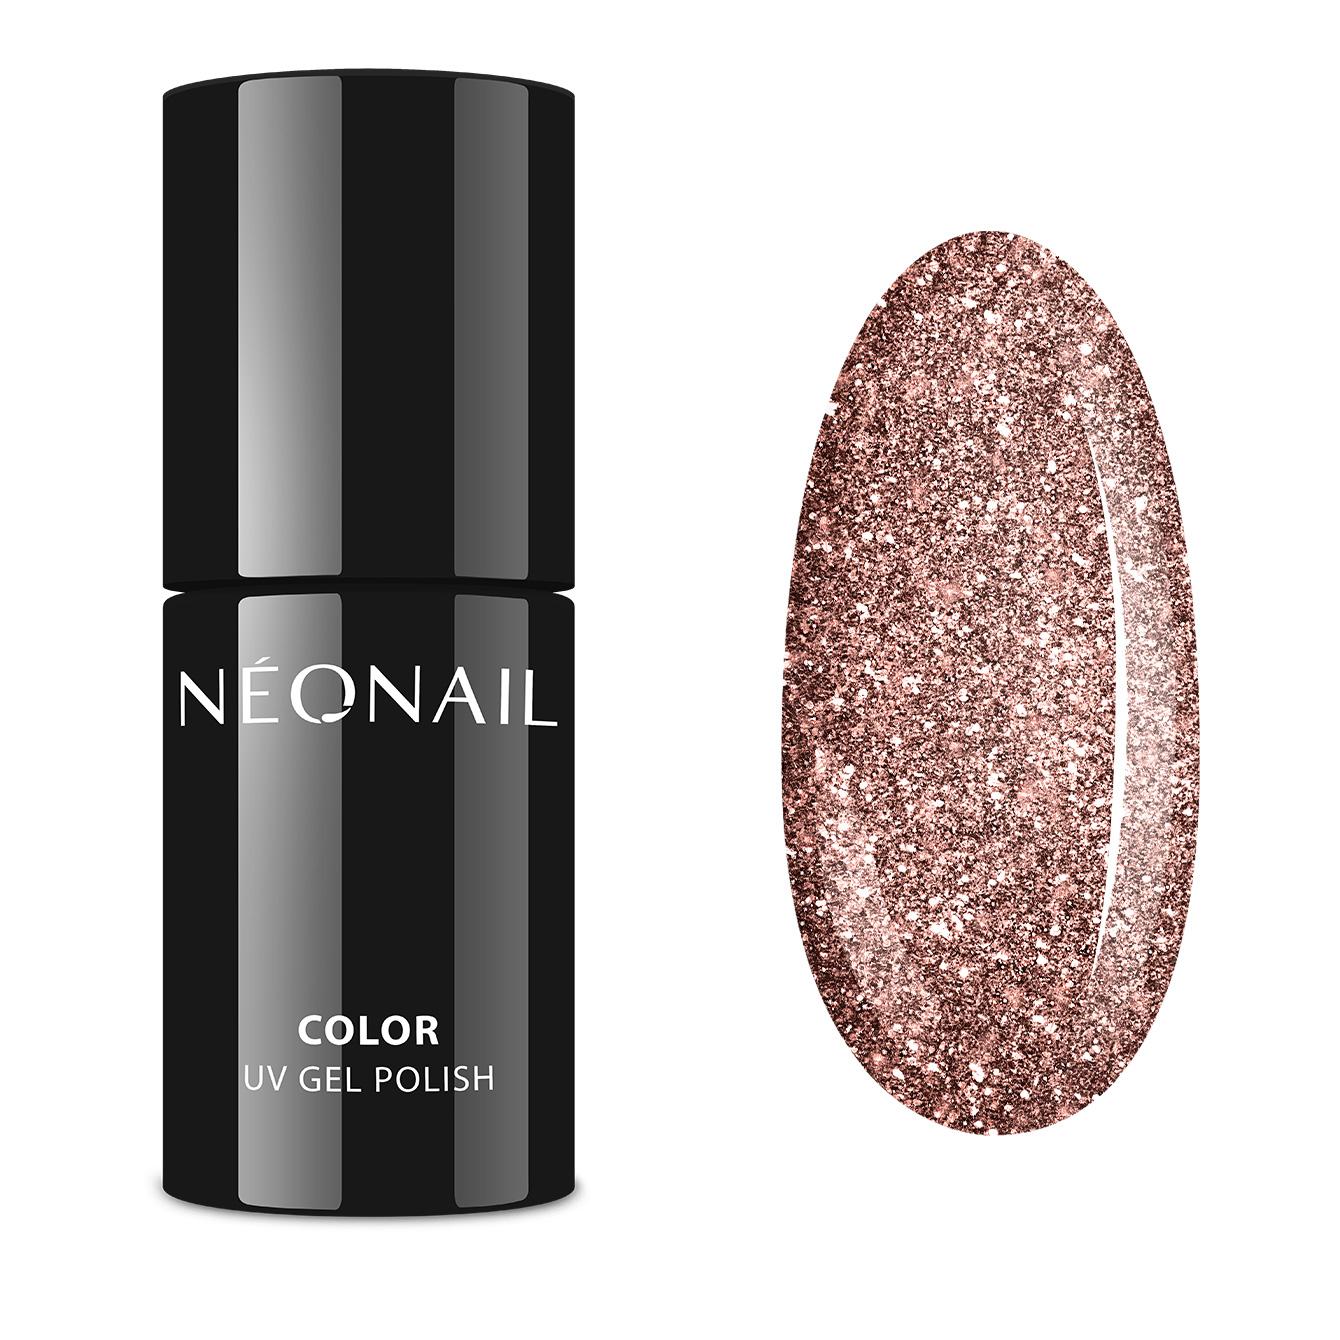 NeoNail Glow The Day